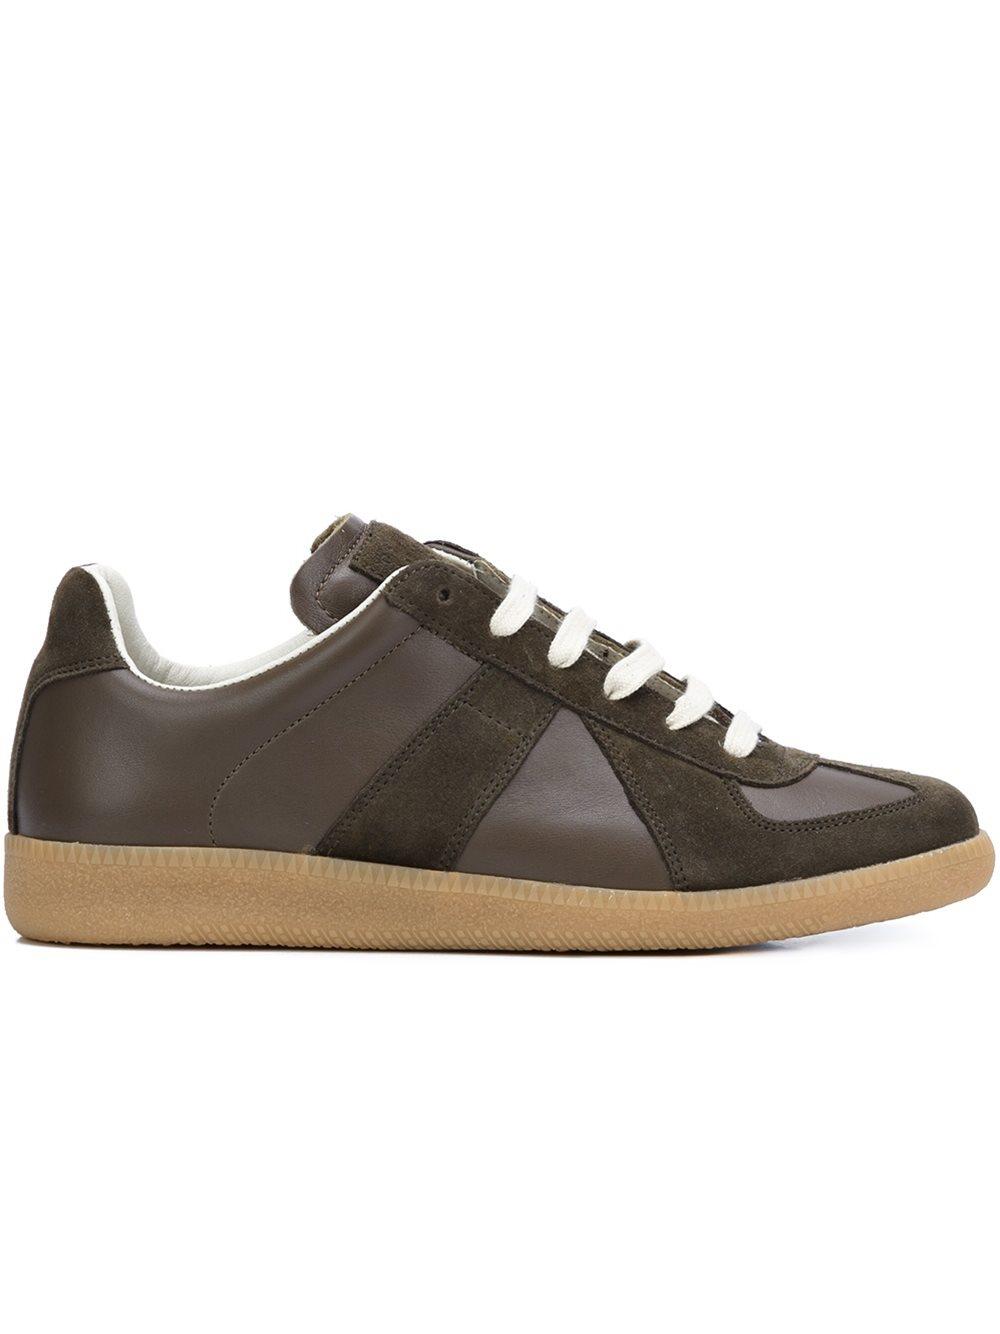 maison margiela 39 replica 39 sneakers in brown for men lyst